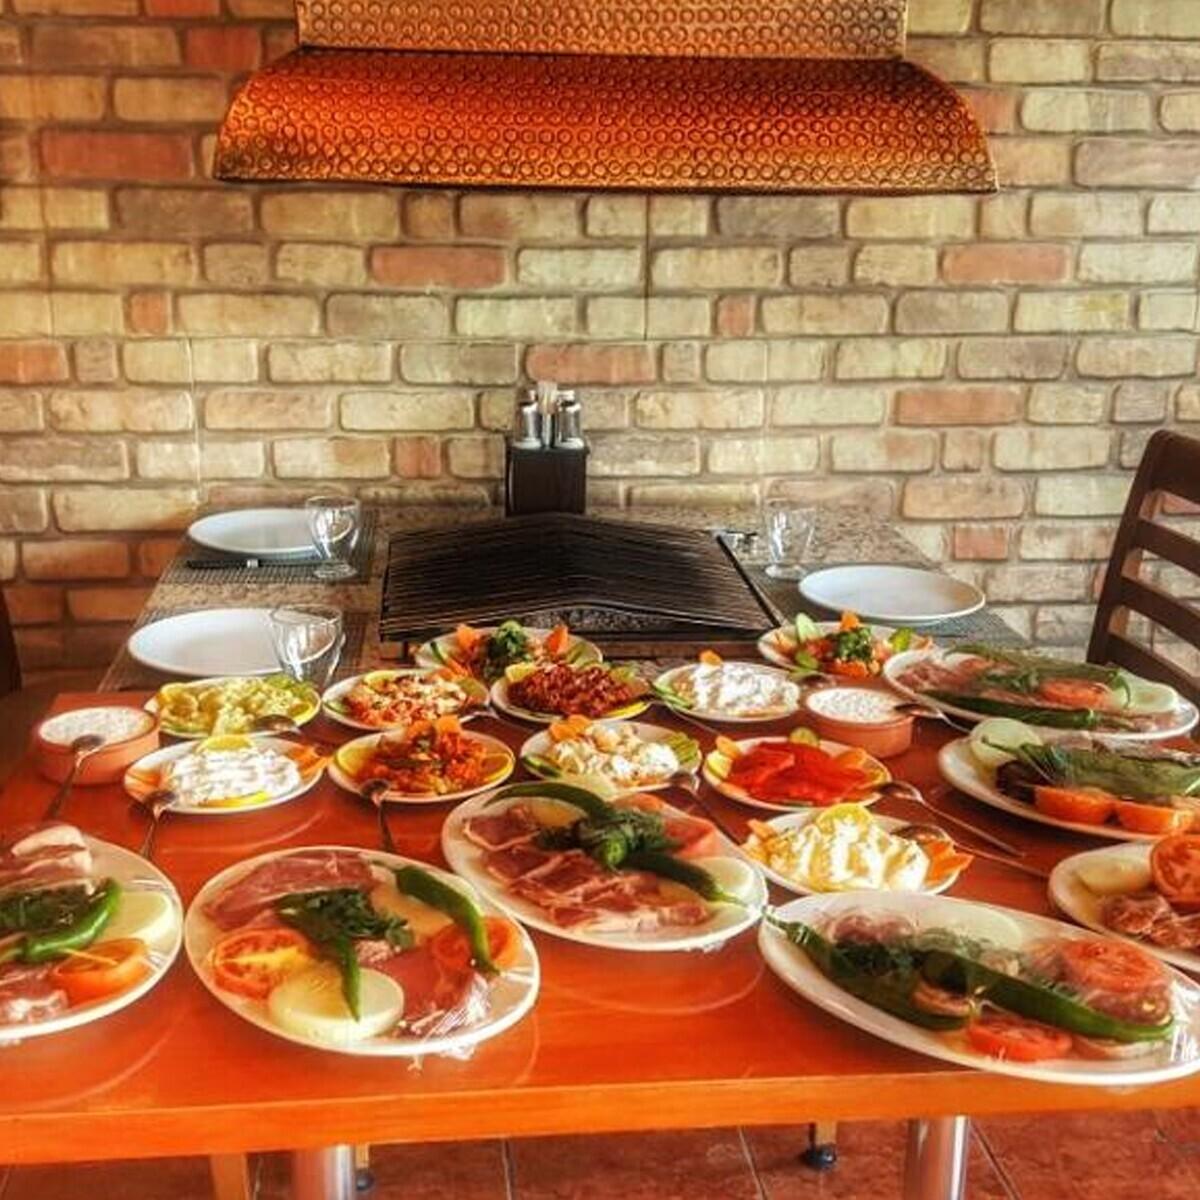 Hanedan Mangalbaşı Restaurant'tan Nefis Karışık Izgara Menüsü